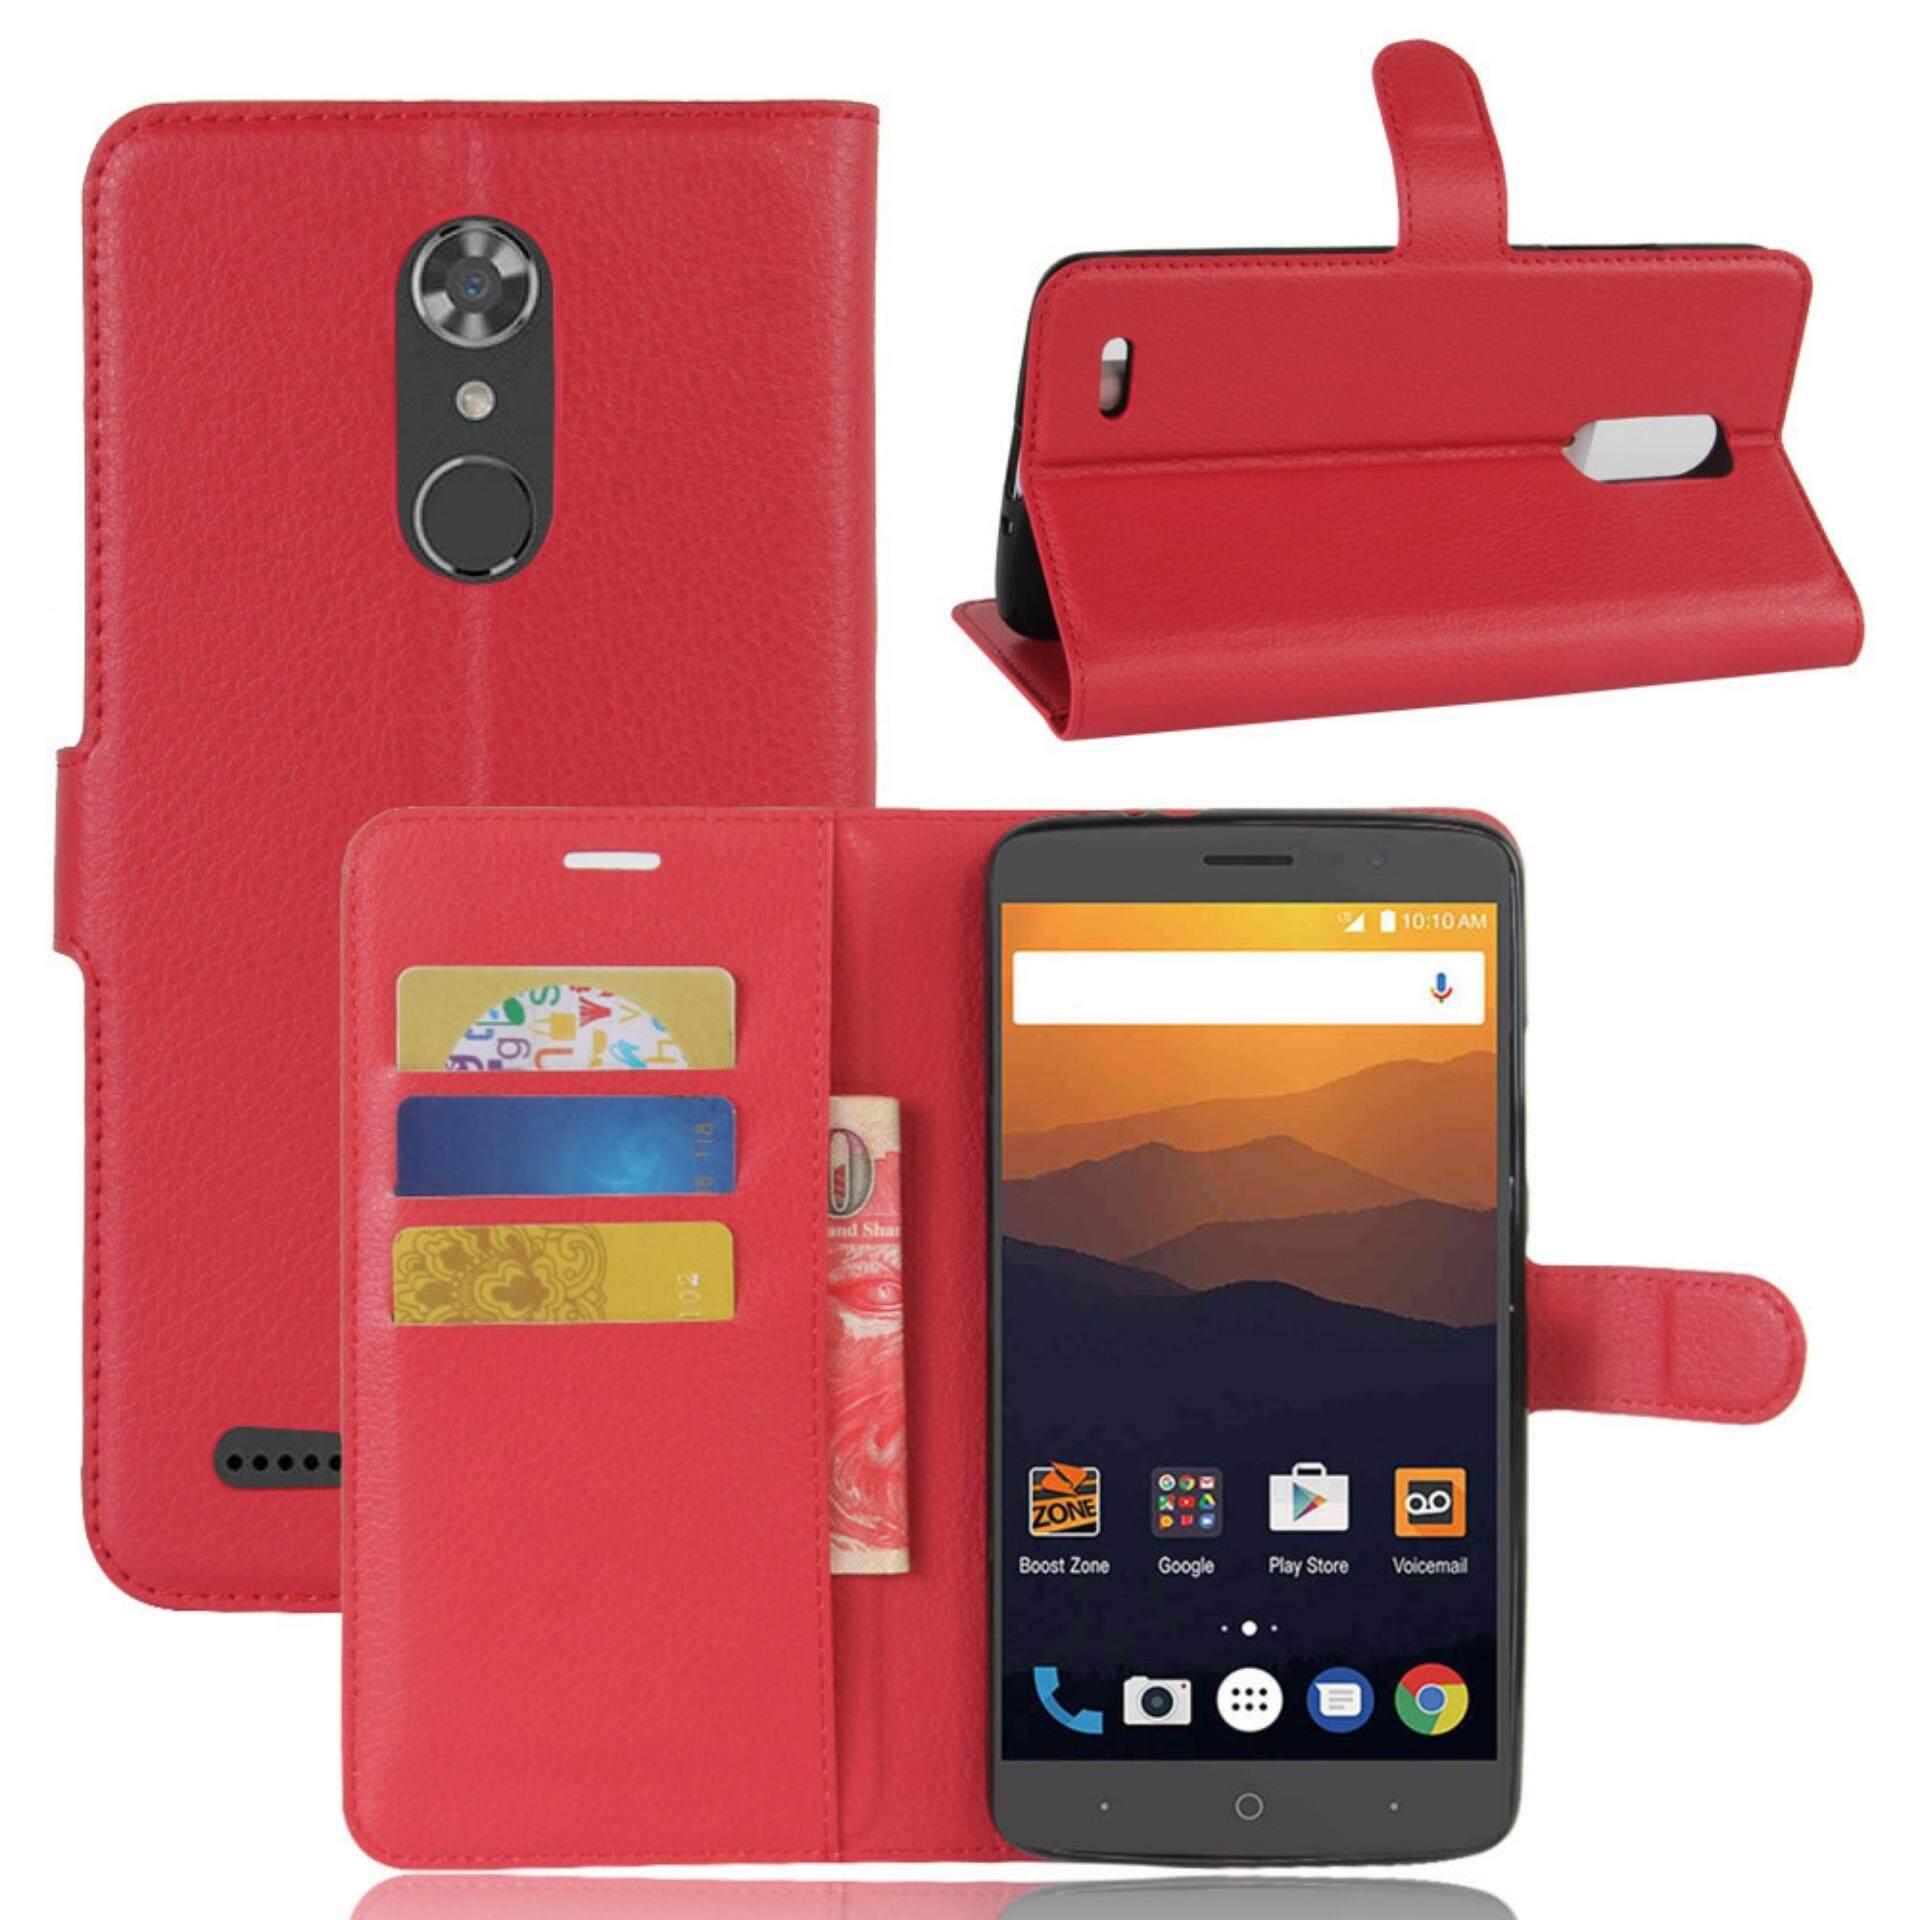 Kulit Lipat Sarung Dompet Pemegang Kartu Case untuk ZTE Maksimum XL N9560/Z986-Internasional